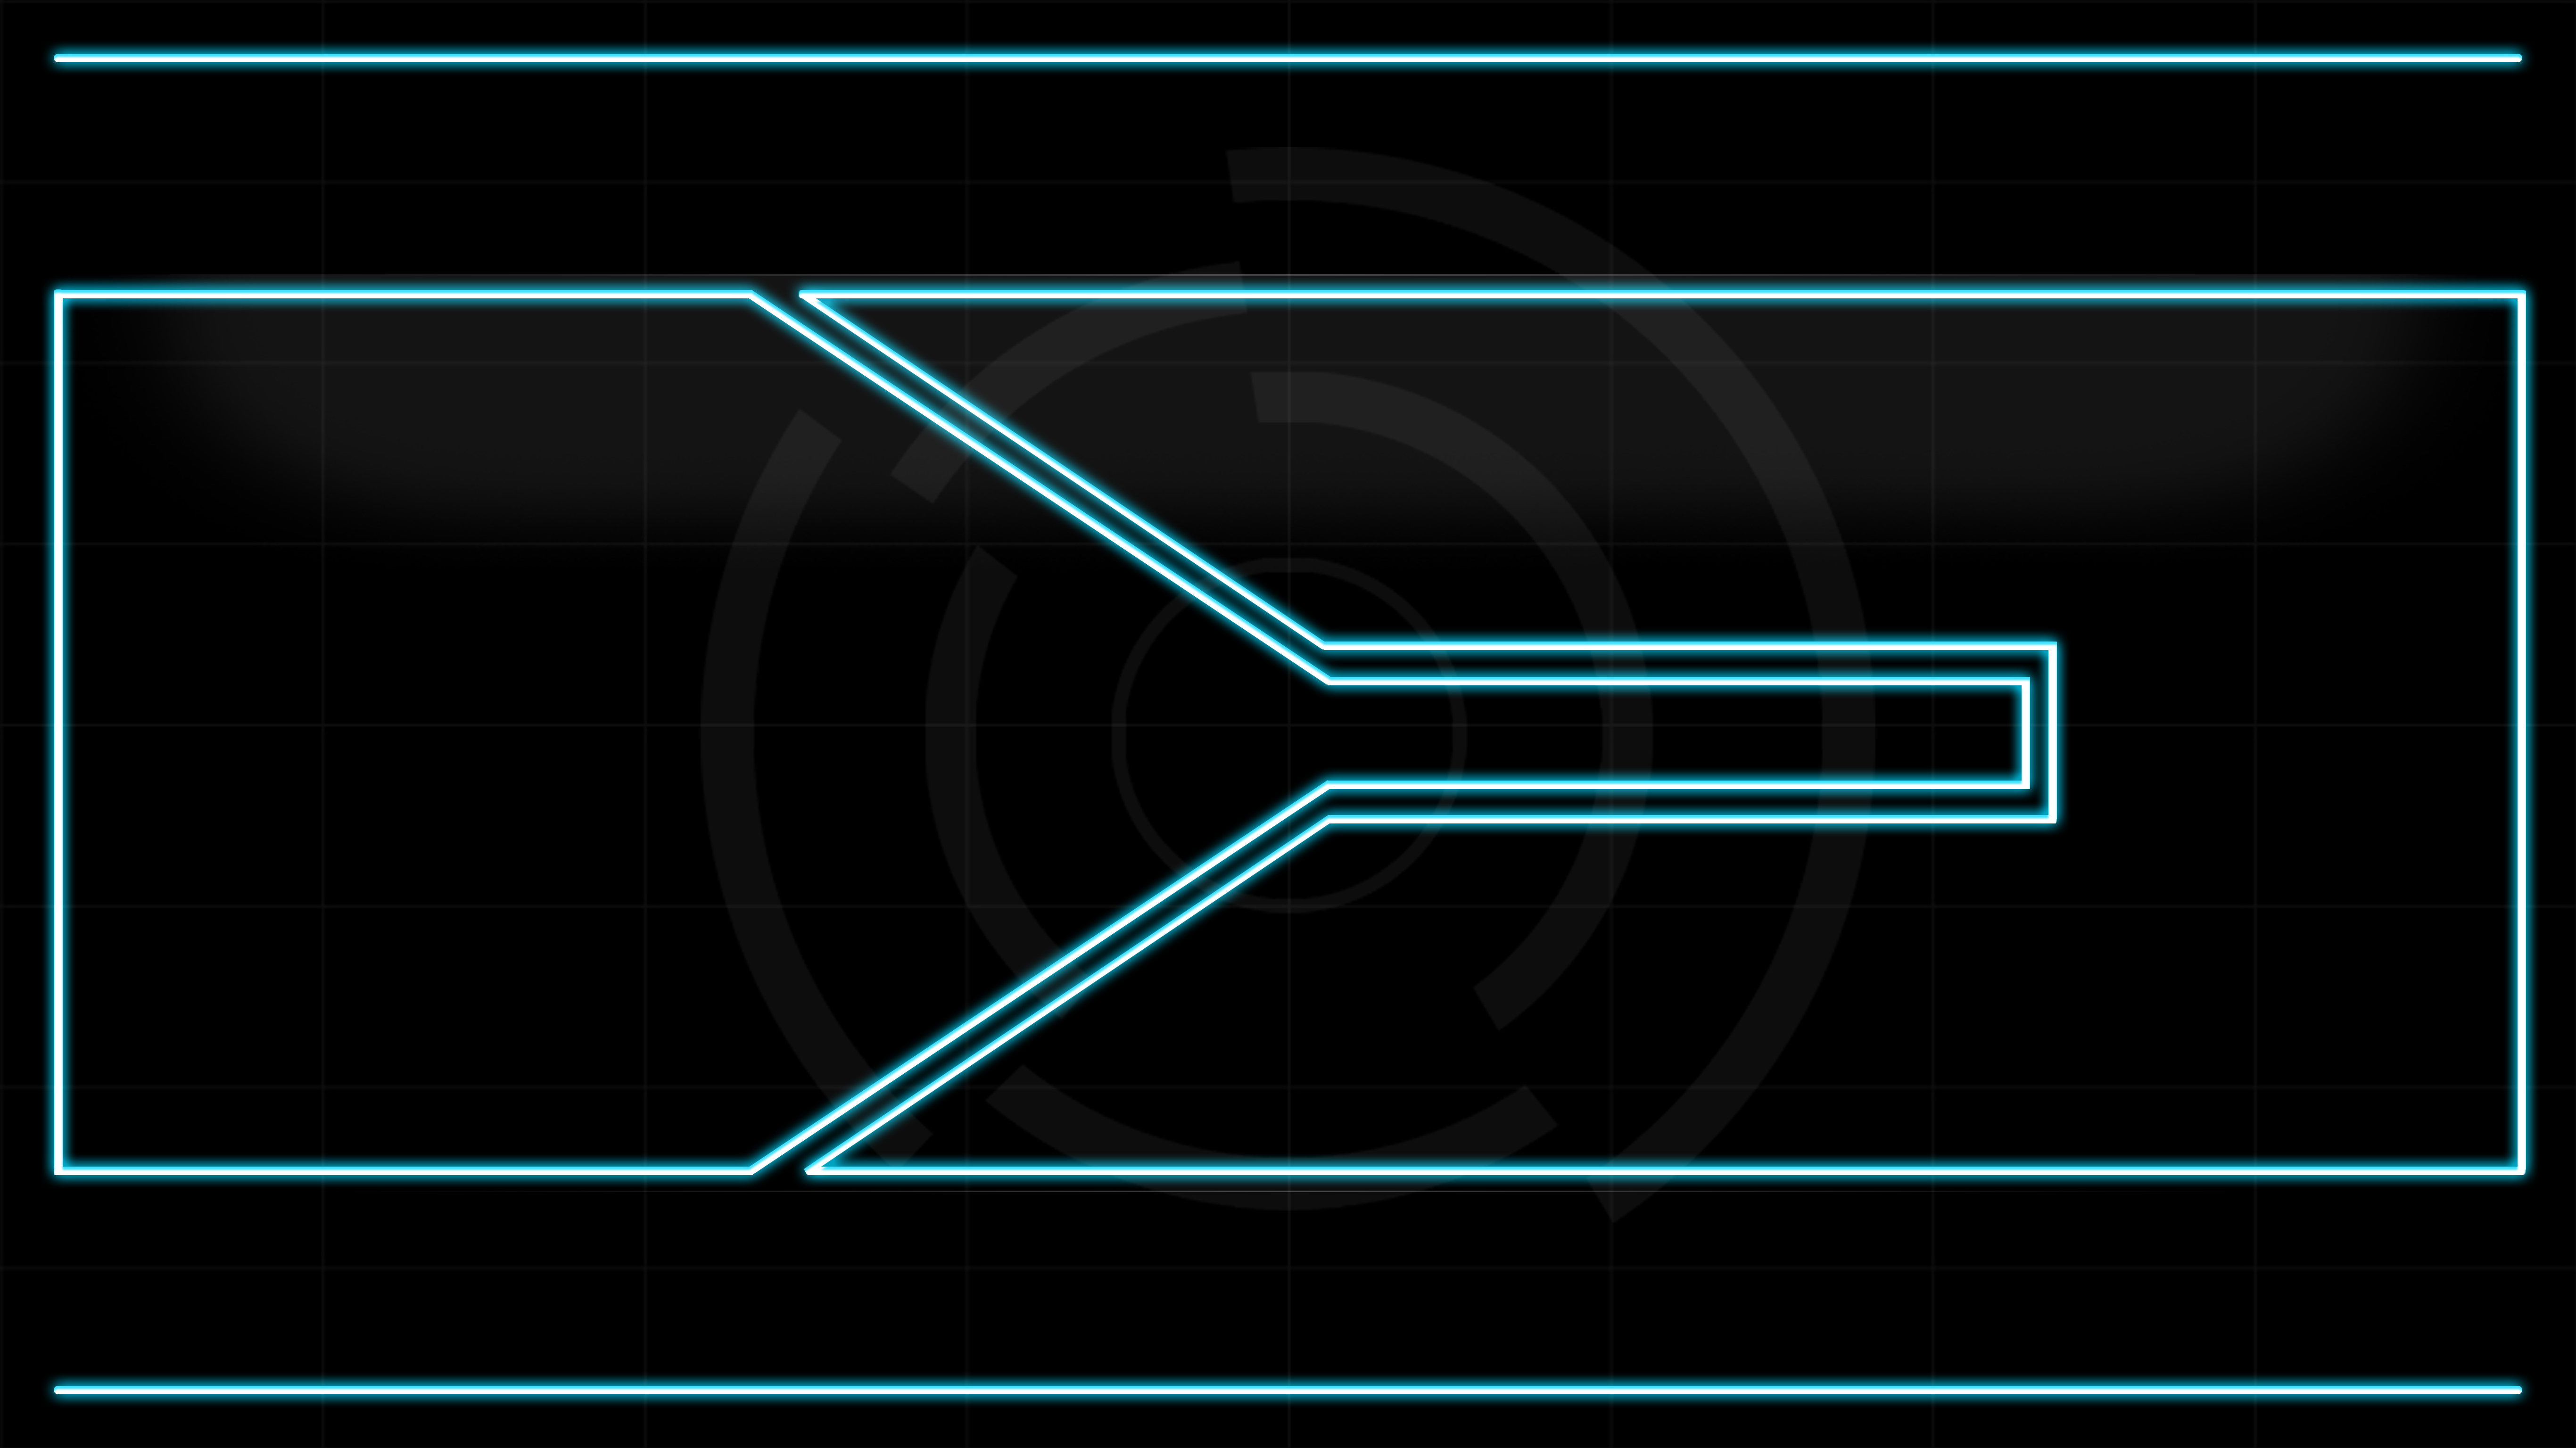 FUTURISTIC TECHNOLOGY 001 By FutureTechCreations On DeviantArt